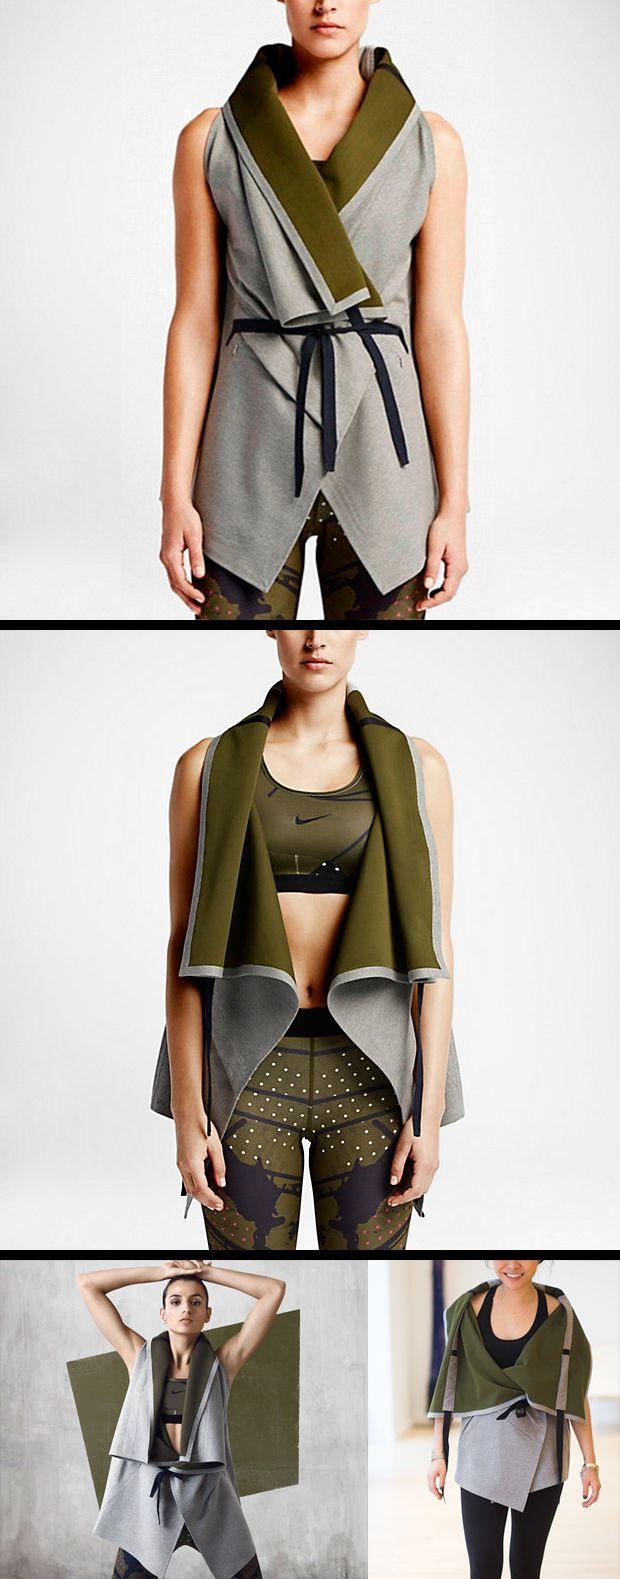 Nike Lab - Johanna F. Schneider